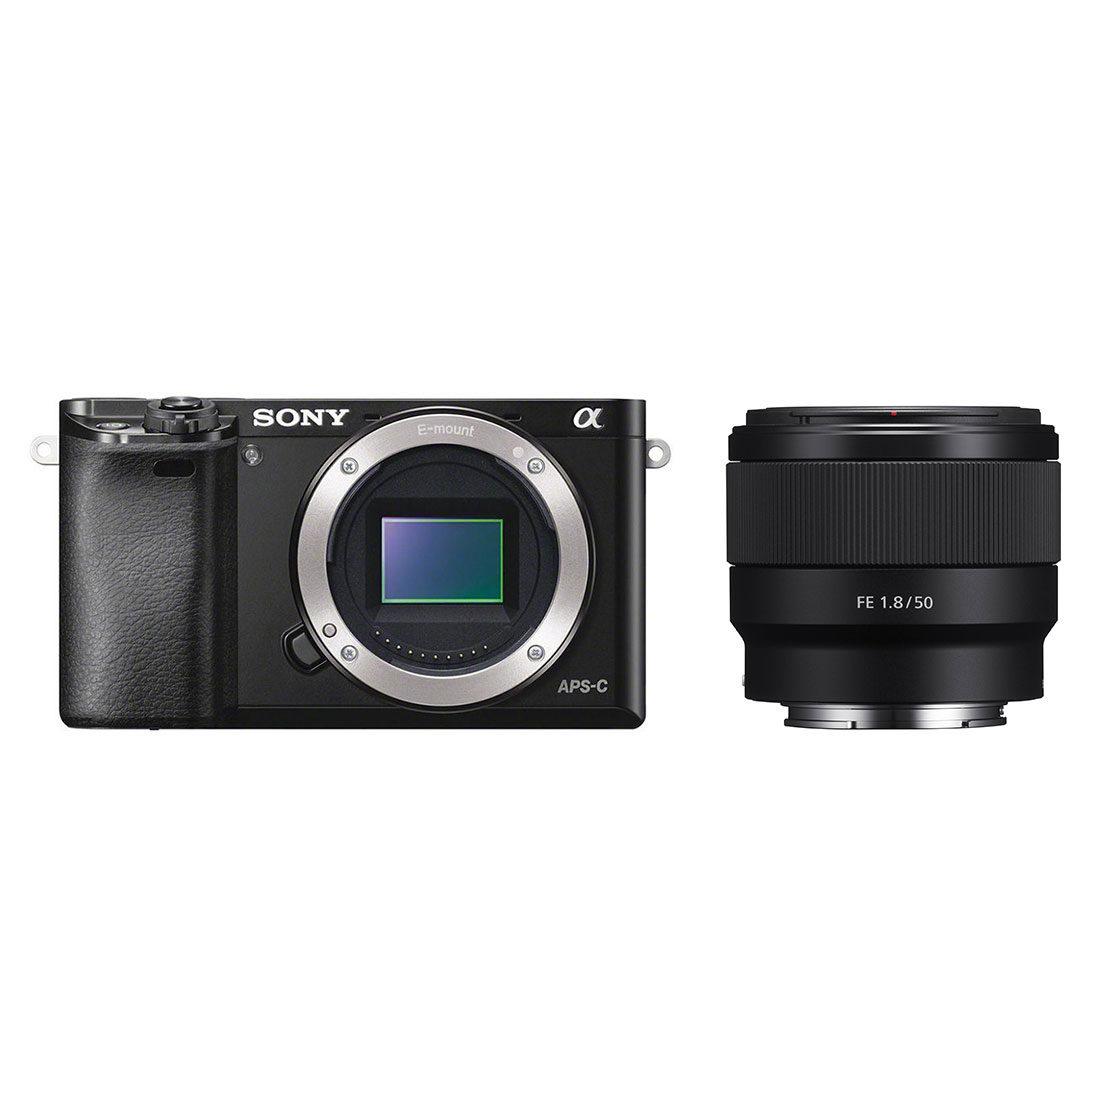 Sony Alpha A6000 ICL systeemcamera Zwart + 50mm f/1.8 <br/>€ 599.00 <br/> <a href='https://www.cameranu.nl/fotografie/?tt=12190_474631_241358_&r=https%3A%2F%2Fwww.cameranu.nl%2Fnl%2Fp3194492%2Fsony-alpha-a6000-icl-systeemcamera-zwart-50mm-f-1-8%3Fchannable%3D002a596964003331393434393238%26utm_campaign%3D%26utm_content%3DSony%2Bsysteemcamera%26utm_source%3DTradetracker%26utm_medium%3Dcpc%26utm_term%3DDigitale%2Bcamera%26apos%3Bs' target='_blank'>naar de winkel</a>